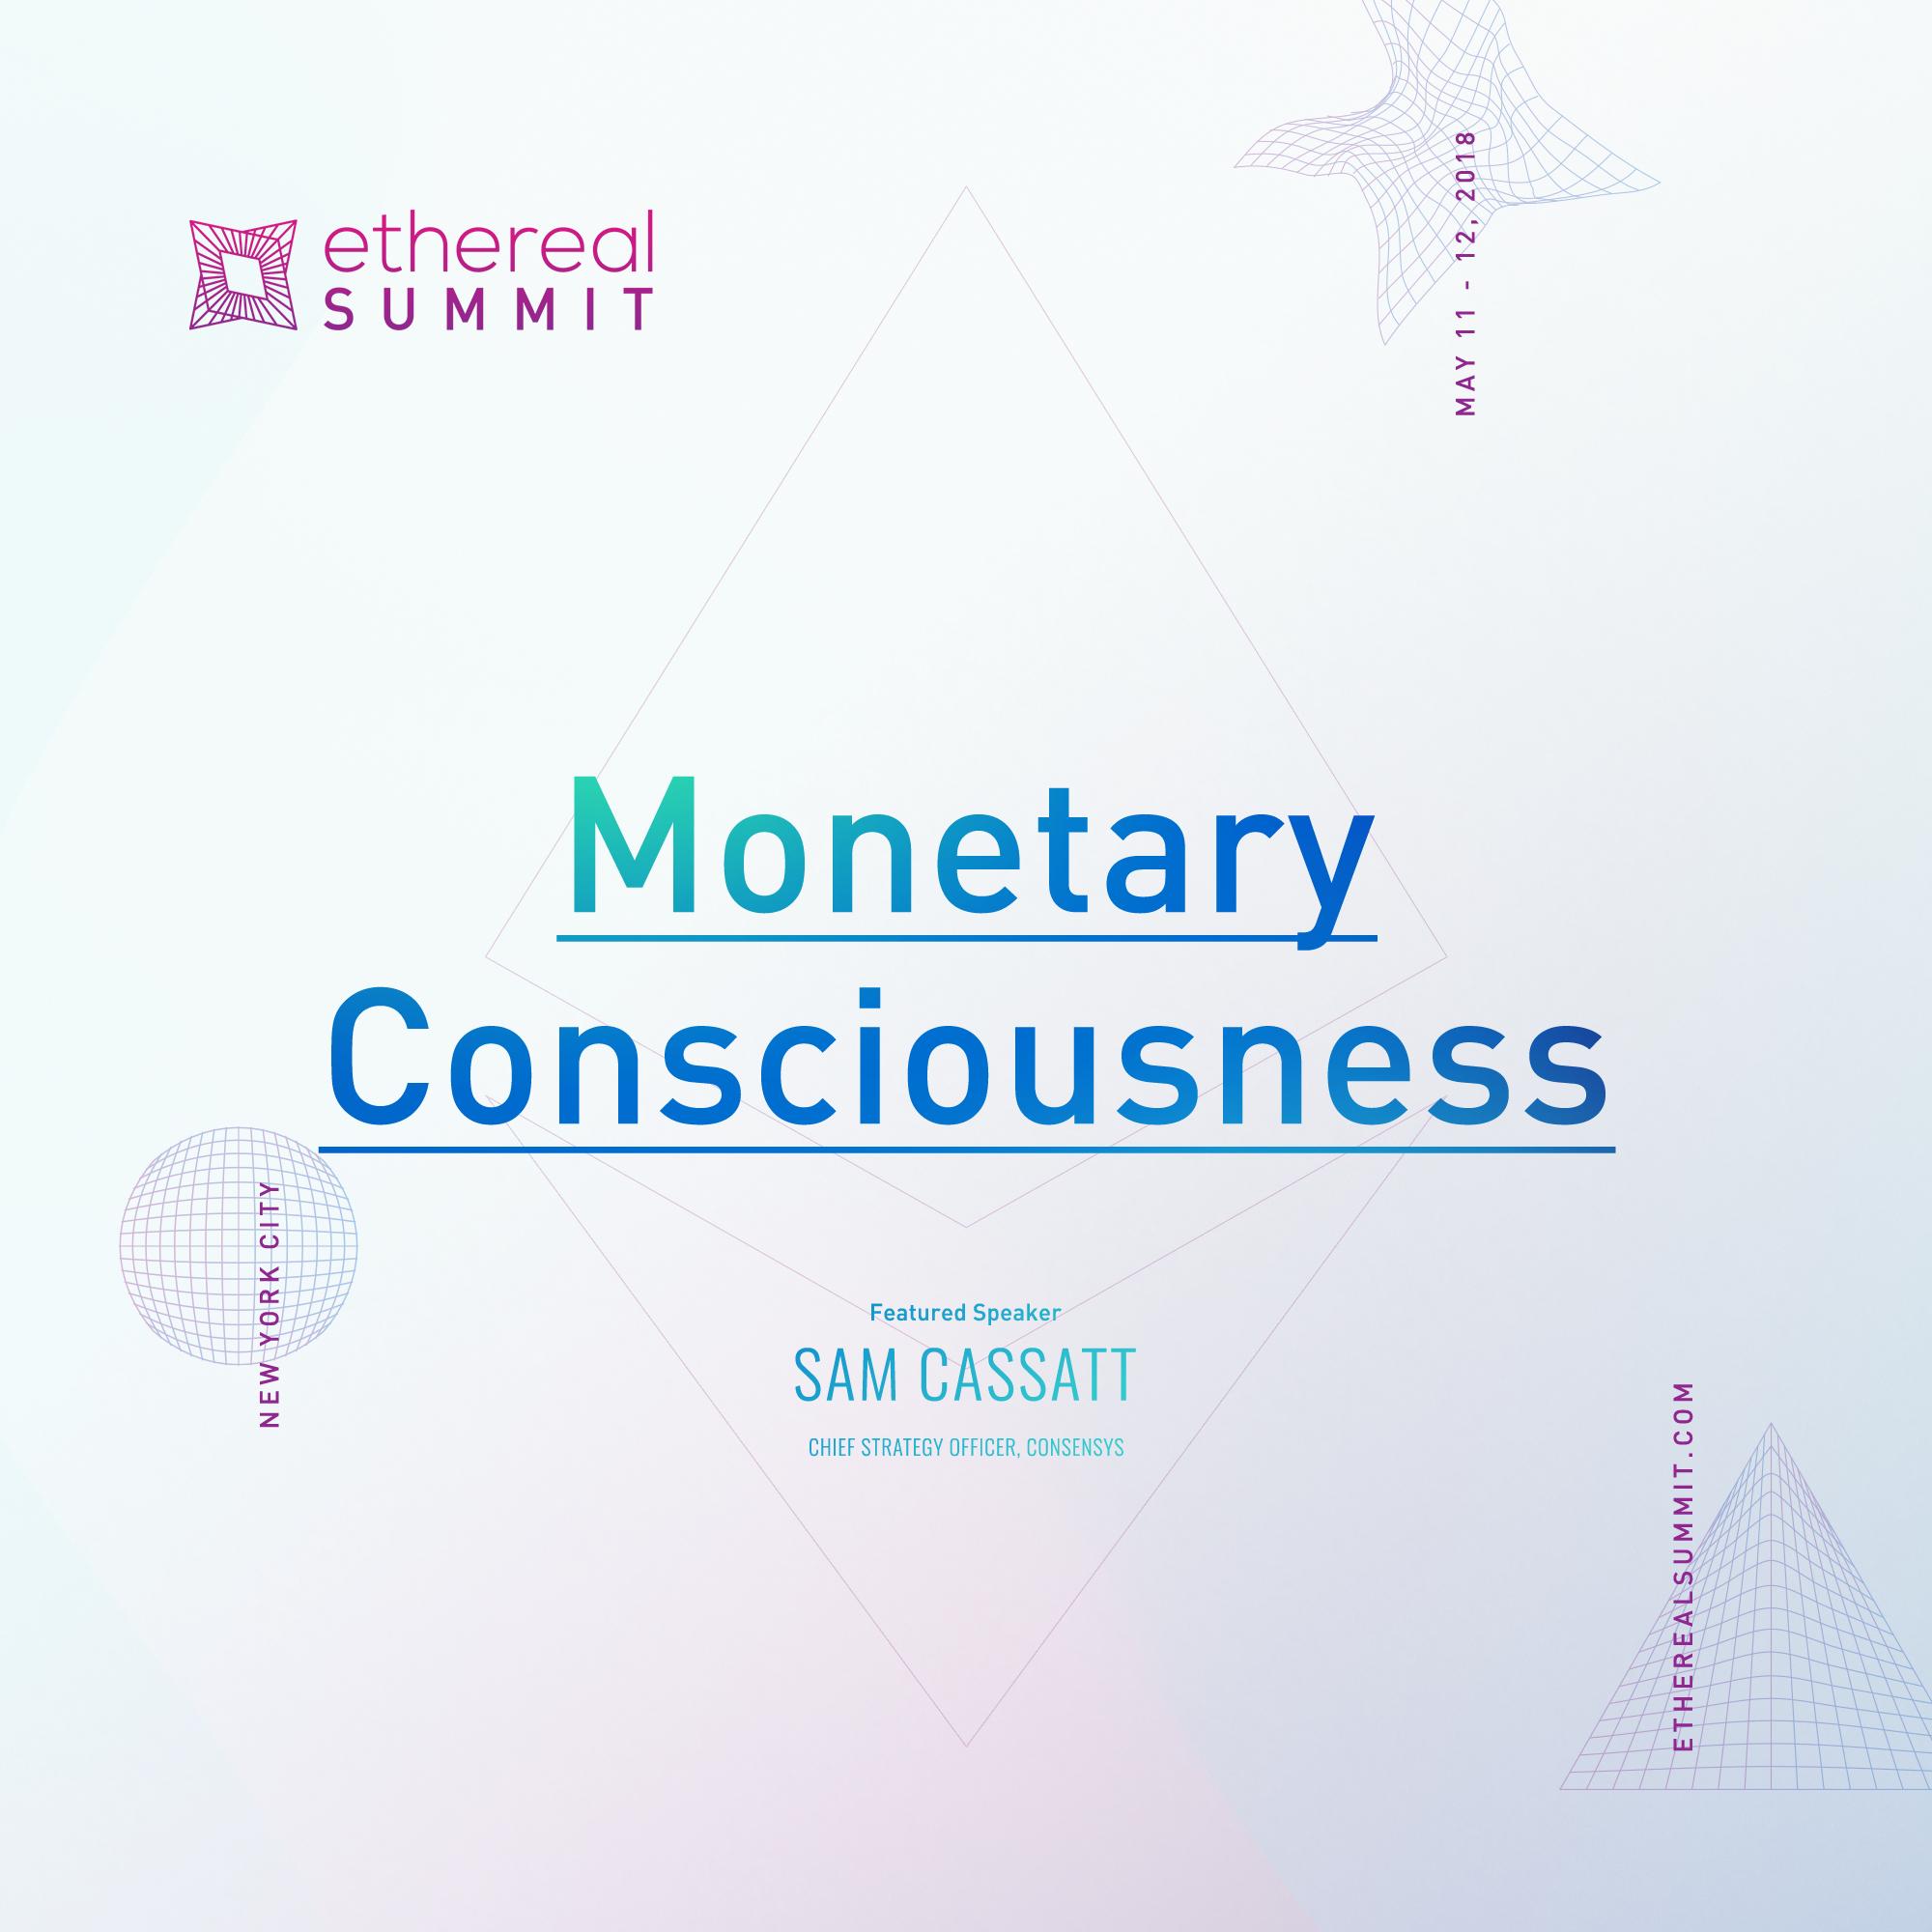 Monetary Consciousness